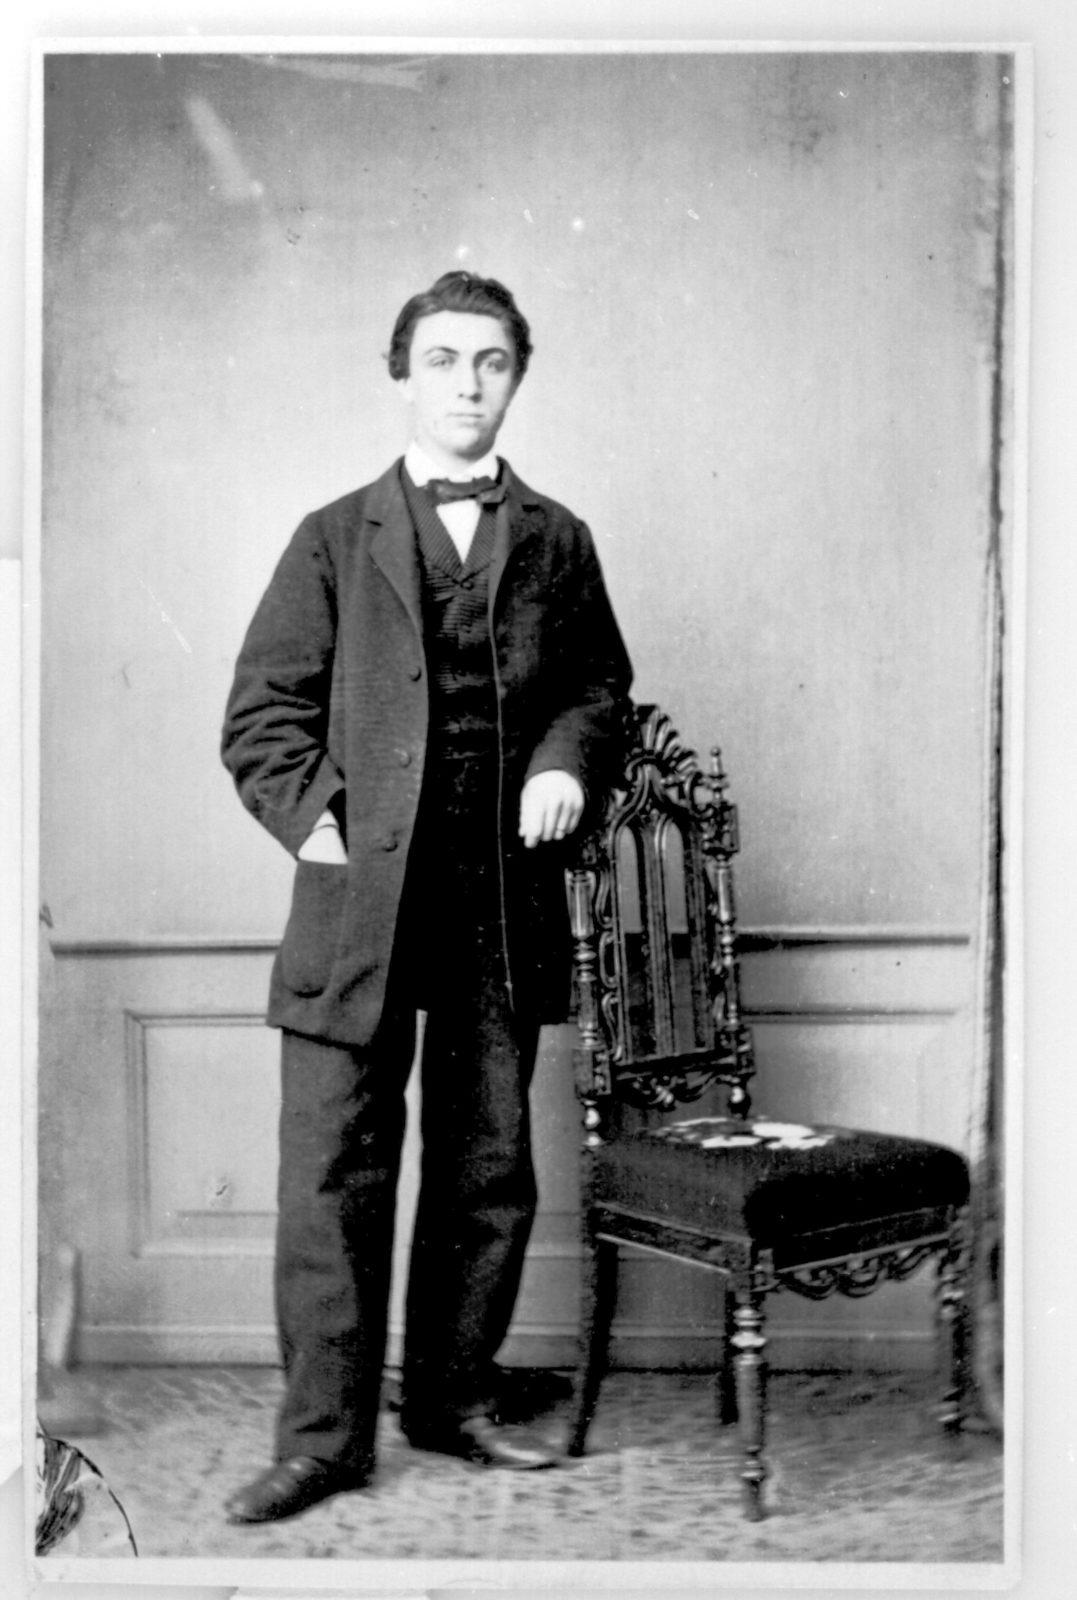 Standing man portrait